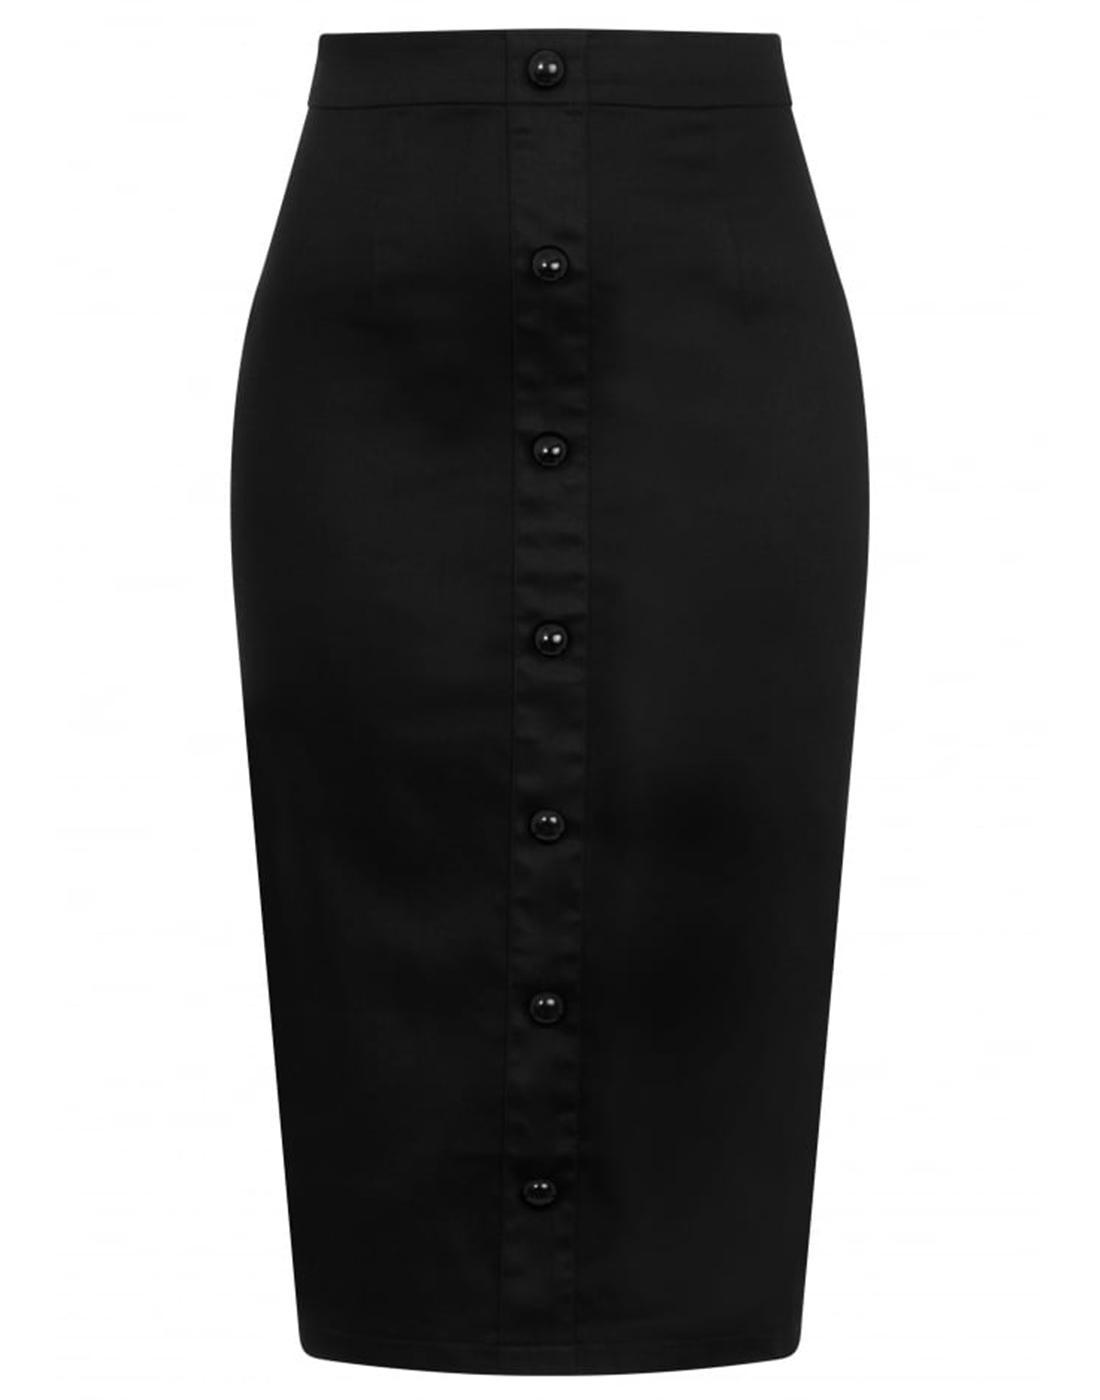 Bettina COLLECTIF Retro Vintage Black Pencil Skirt